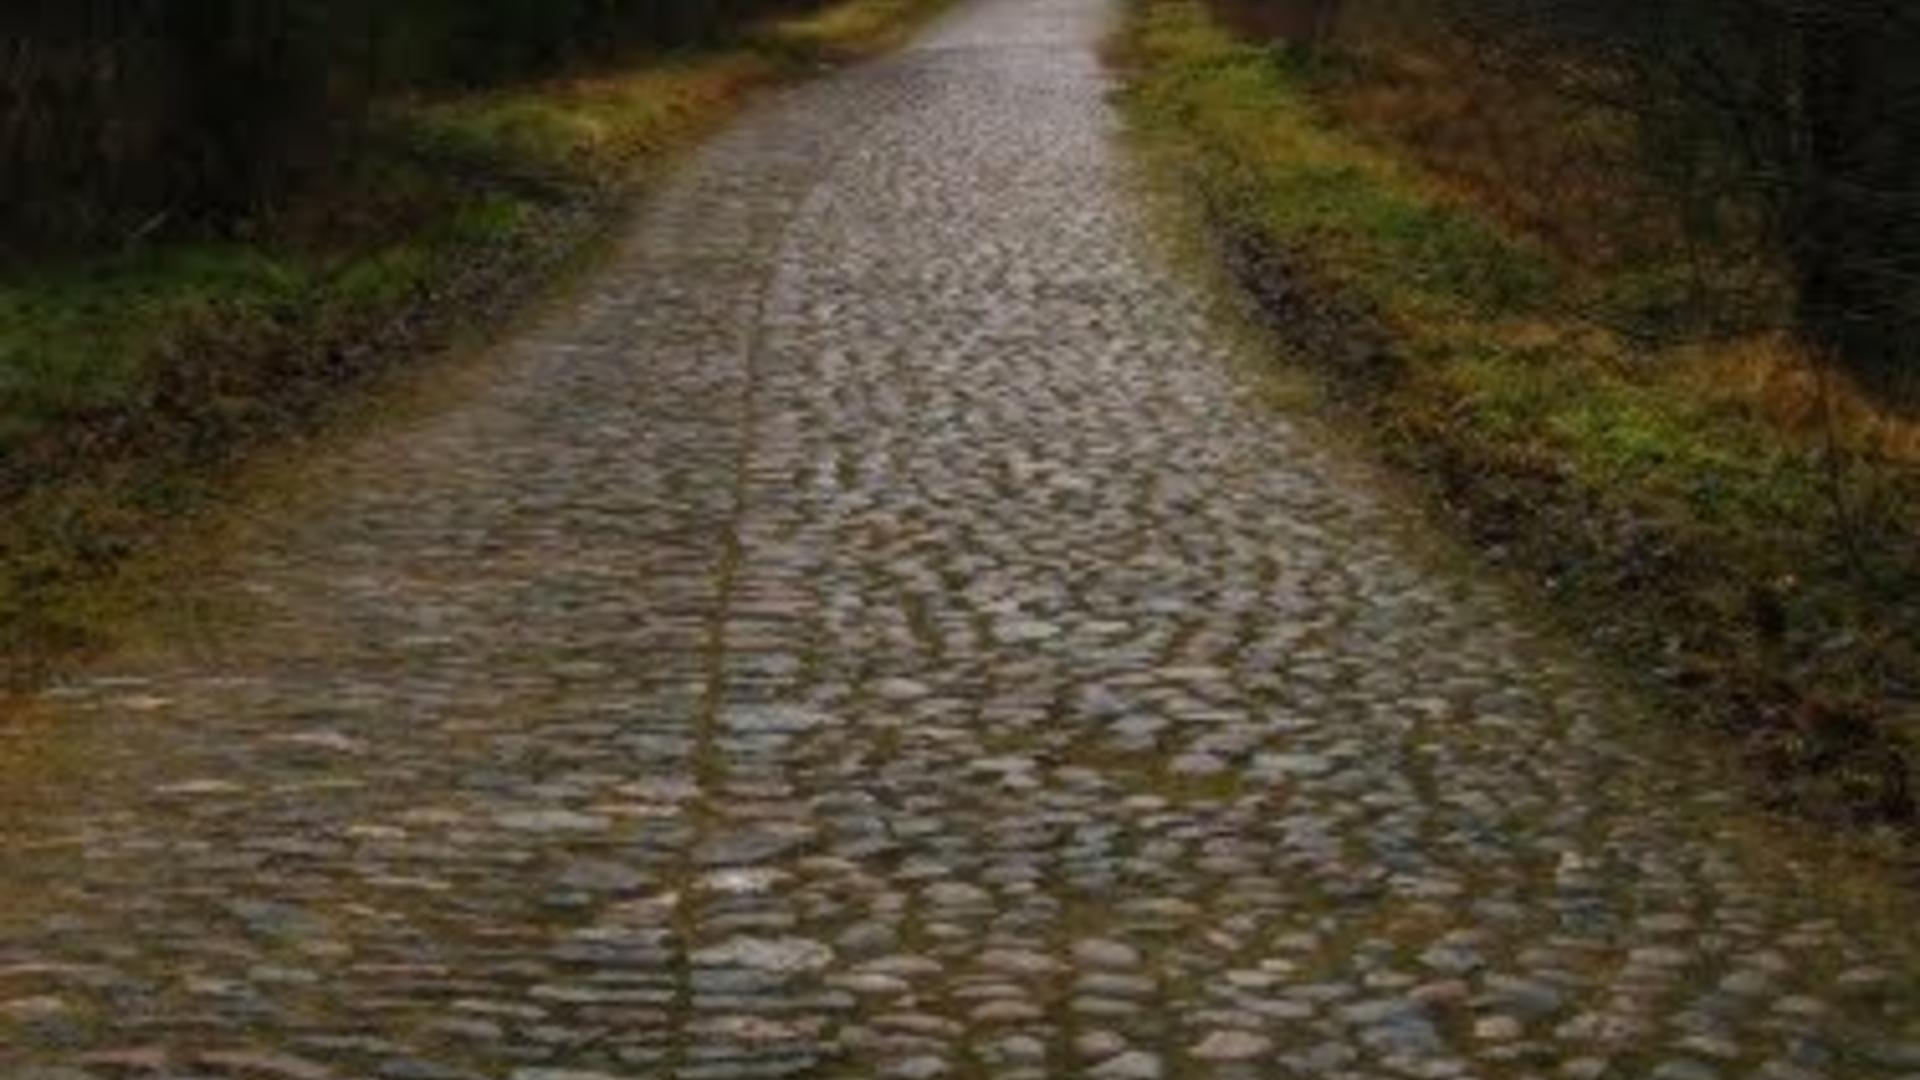 Rock roadway fragment